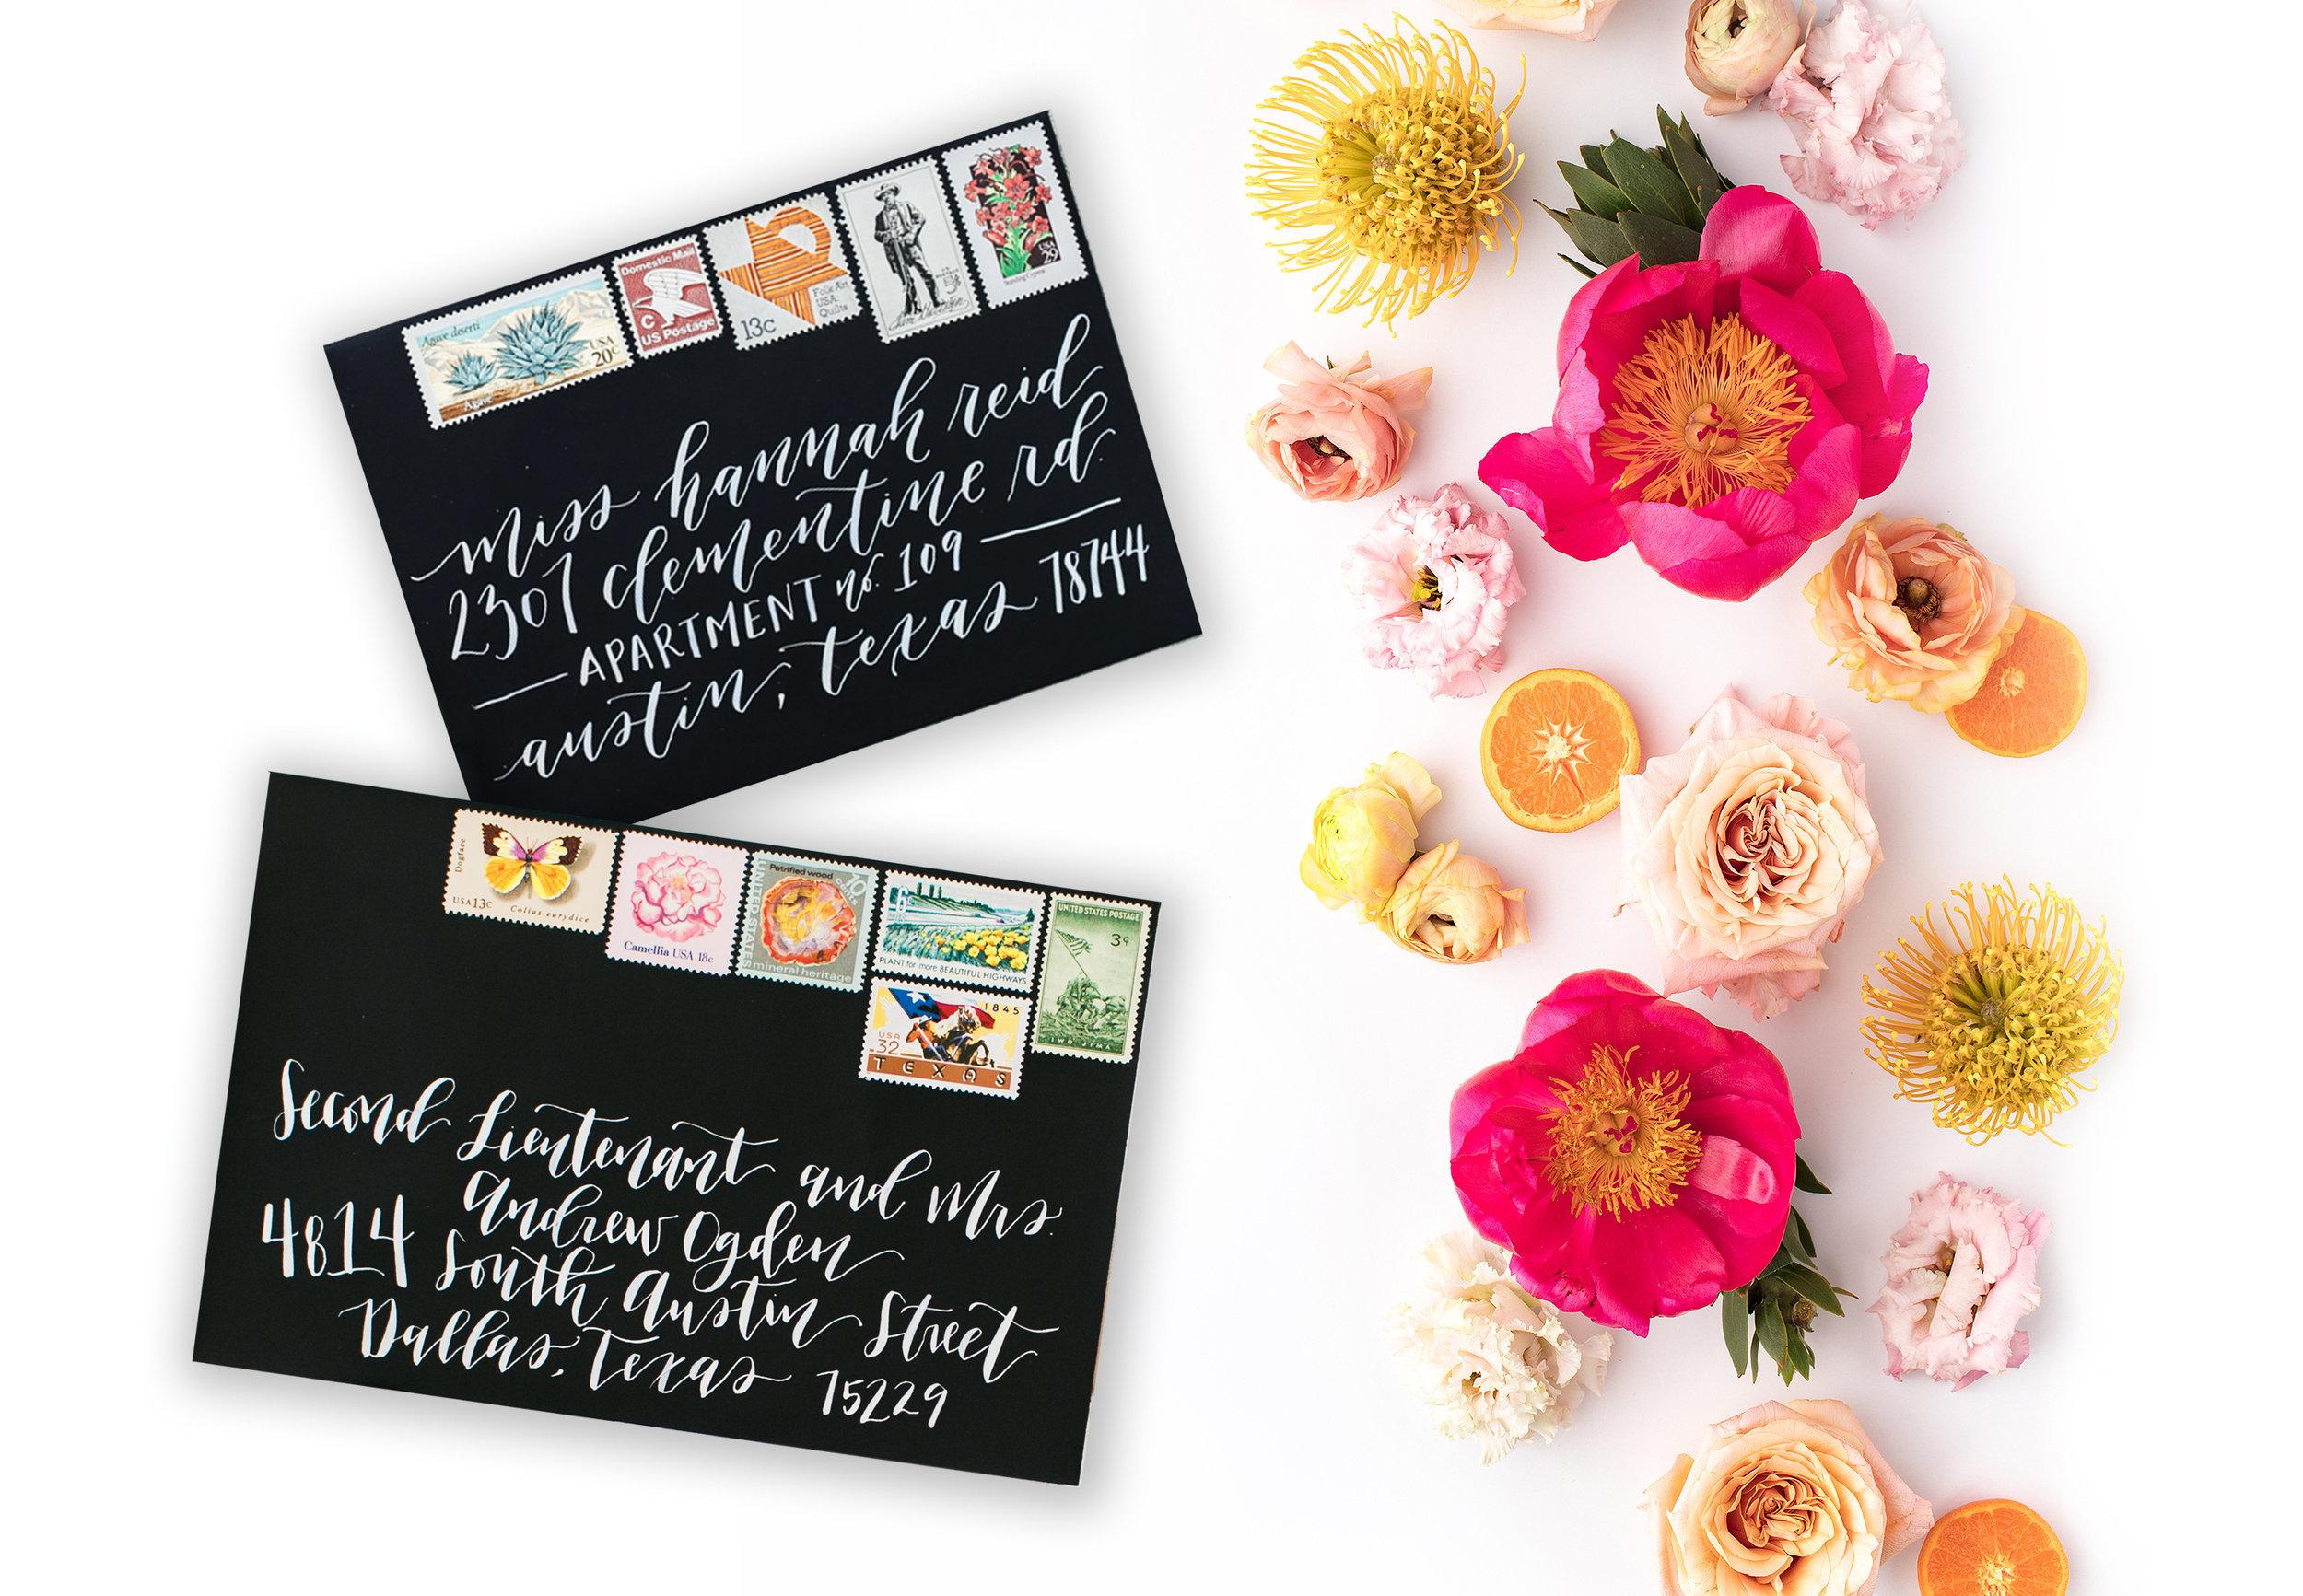 custom wedding invitations with vintage stamps